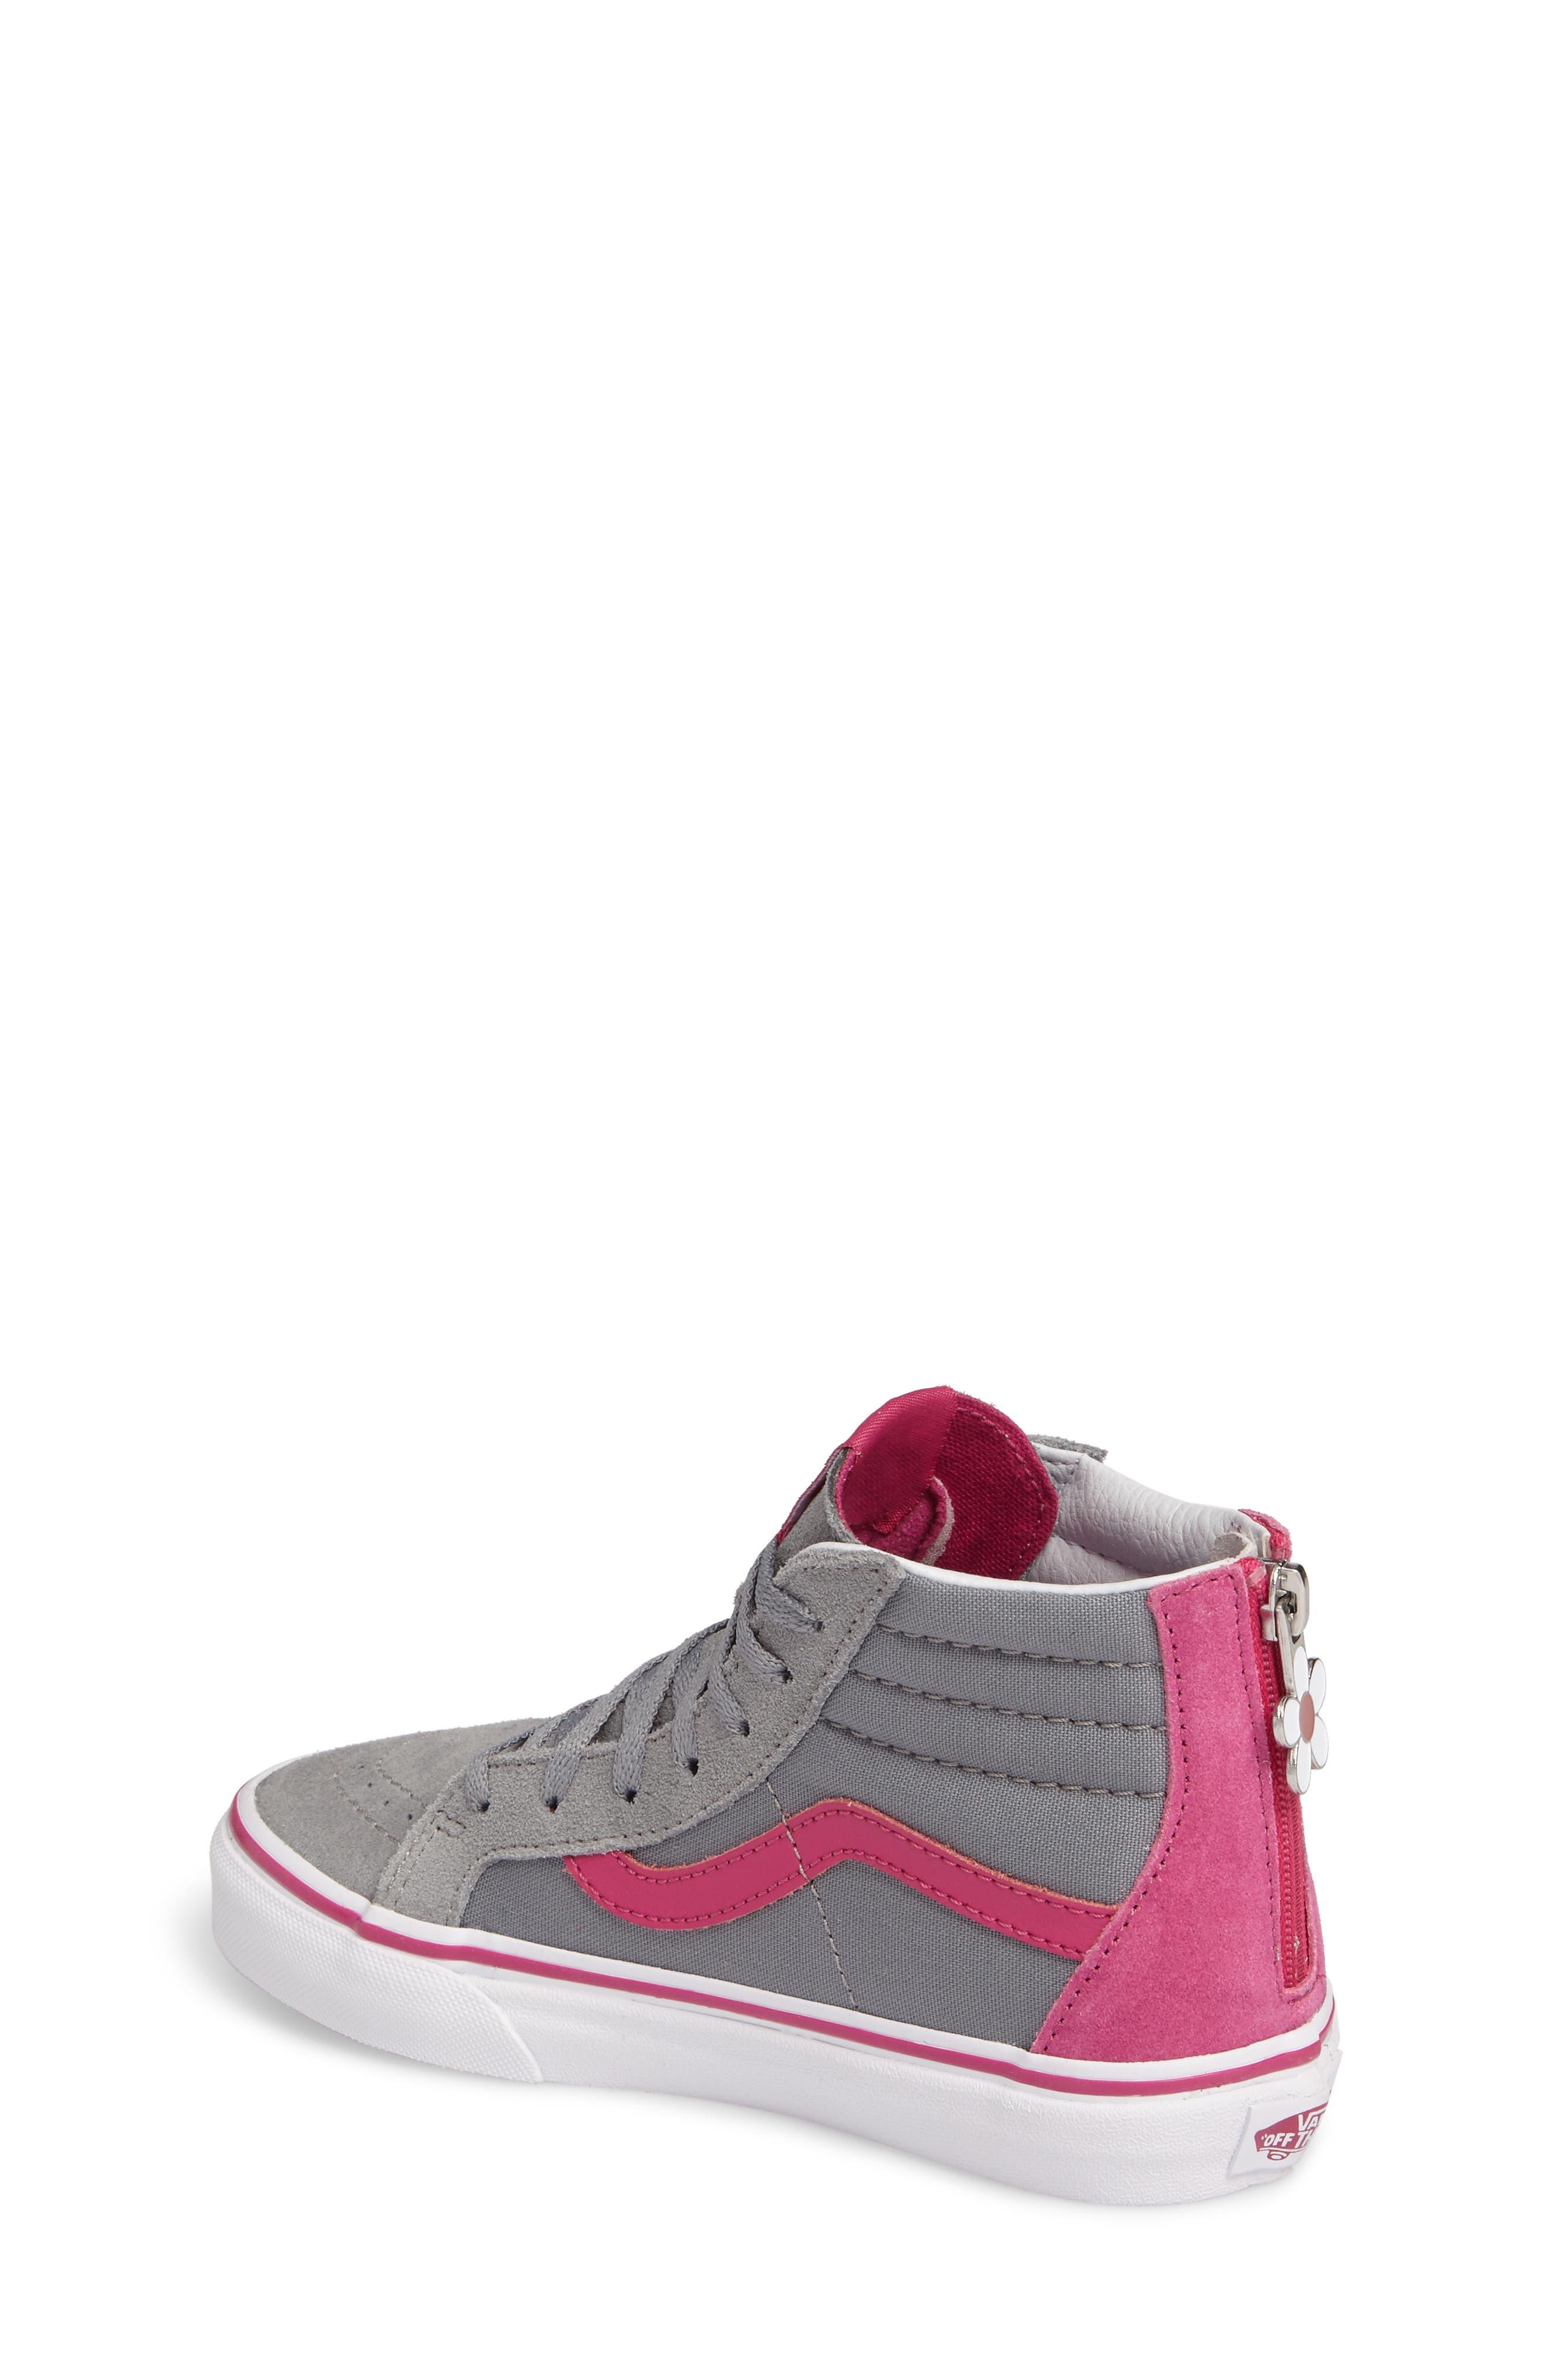 Alternate Image 2  - Vans SK8-Hi Zip-Up Sneaker (Toddler, Little Kid & Big Kid)